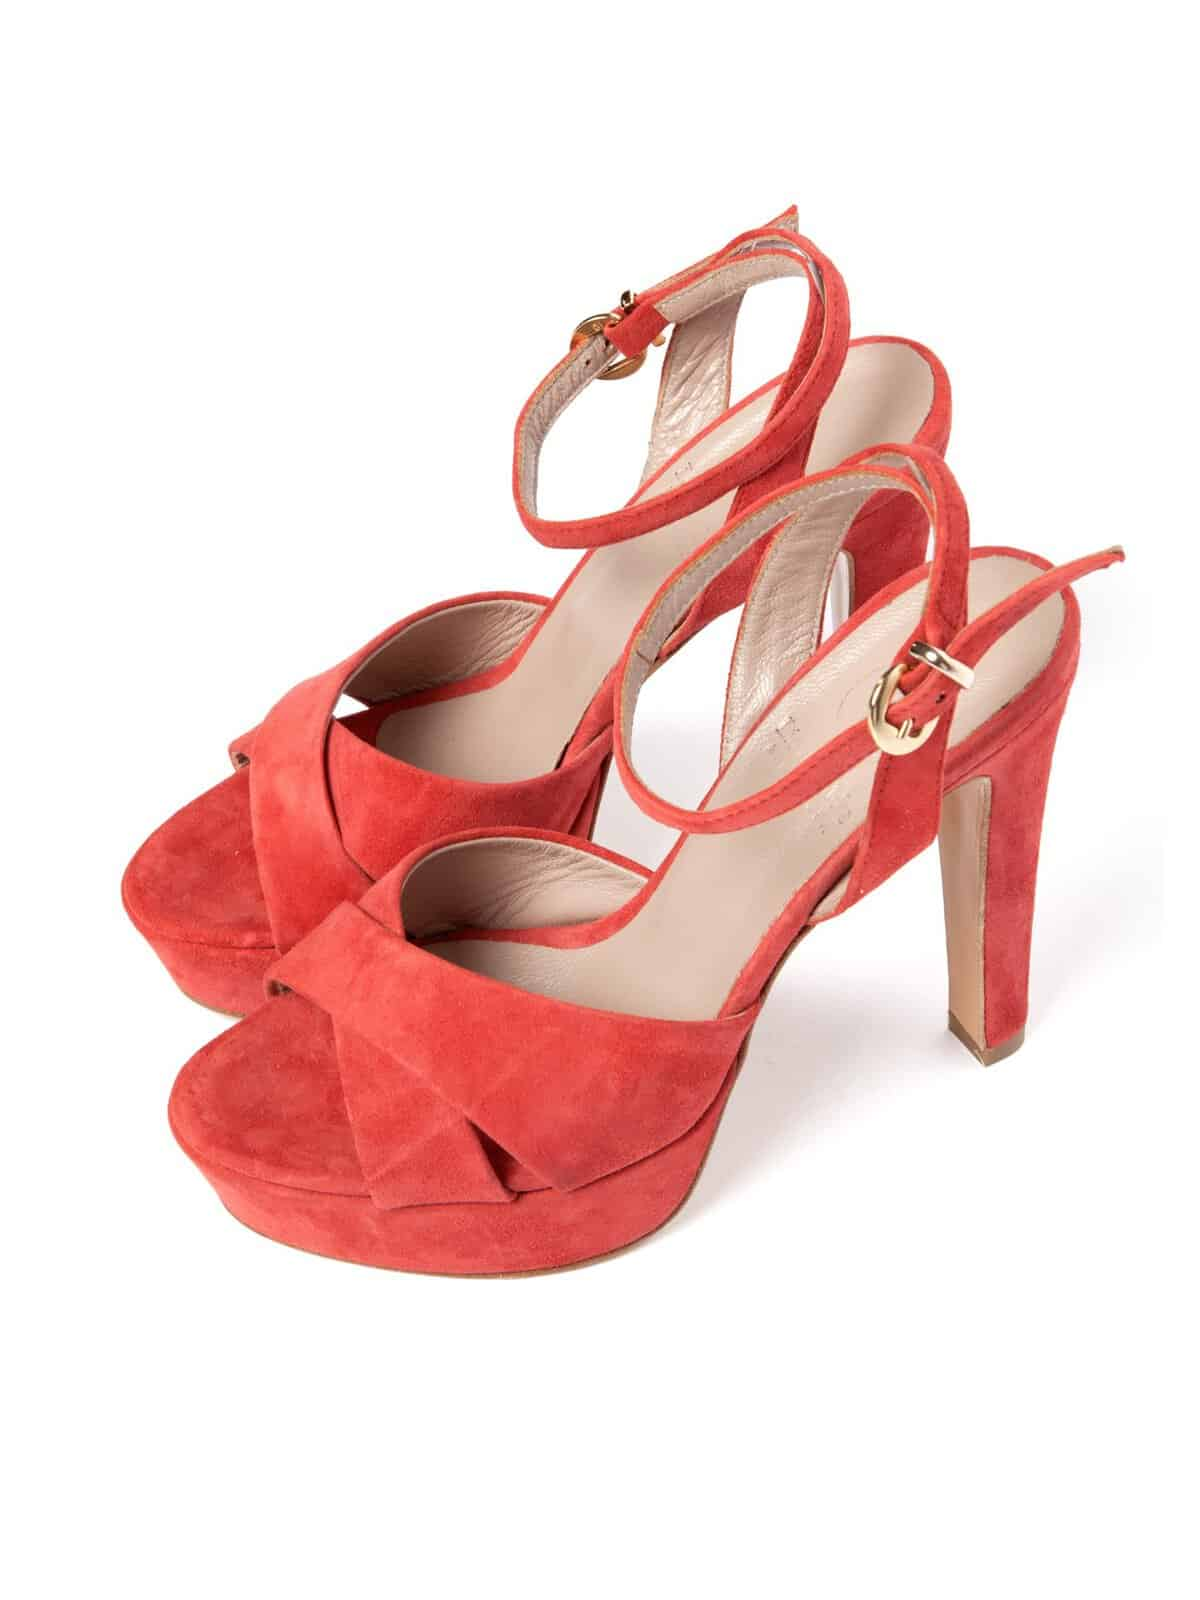 sandalia rosa 2